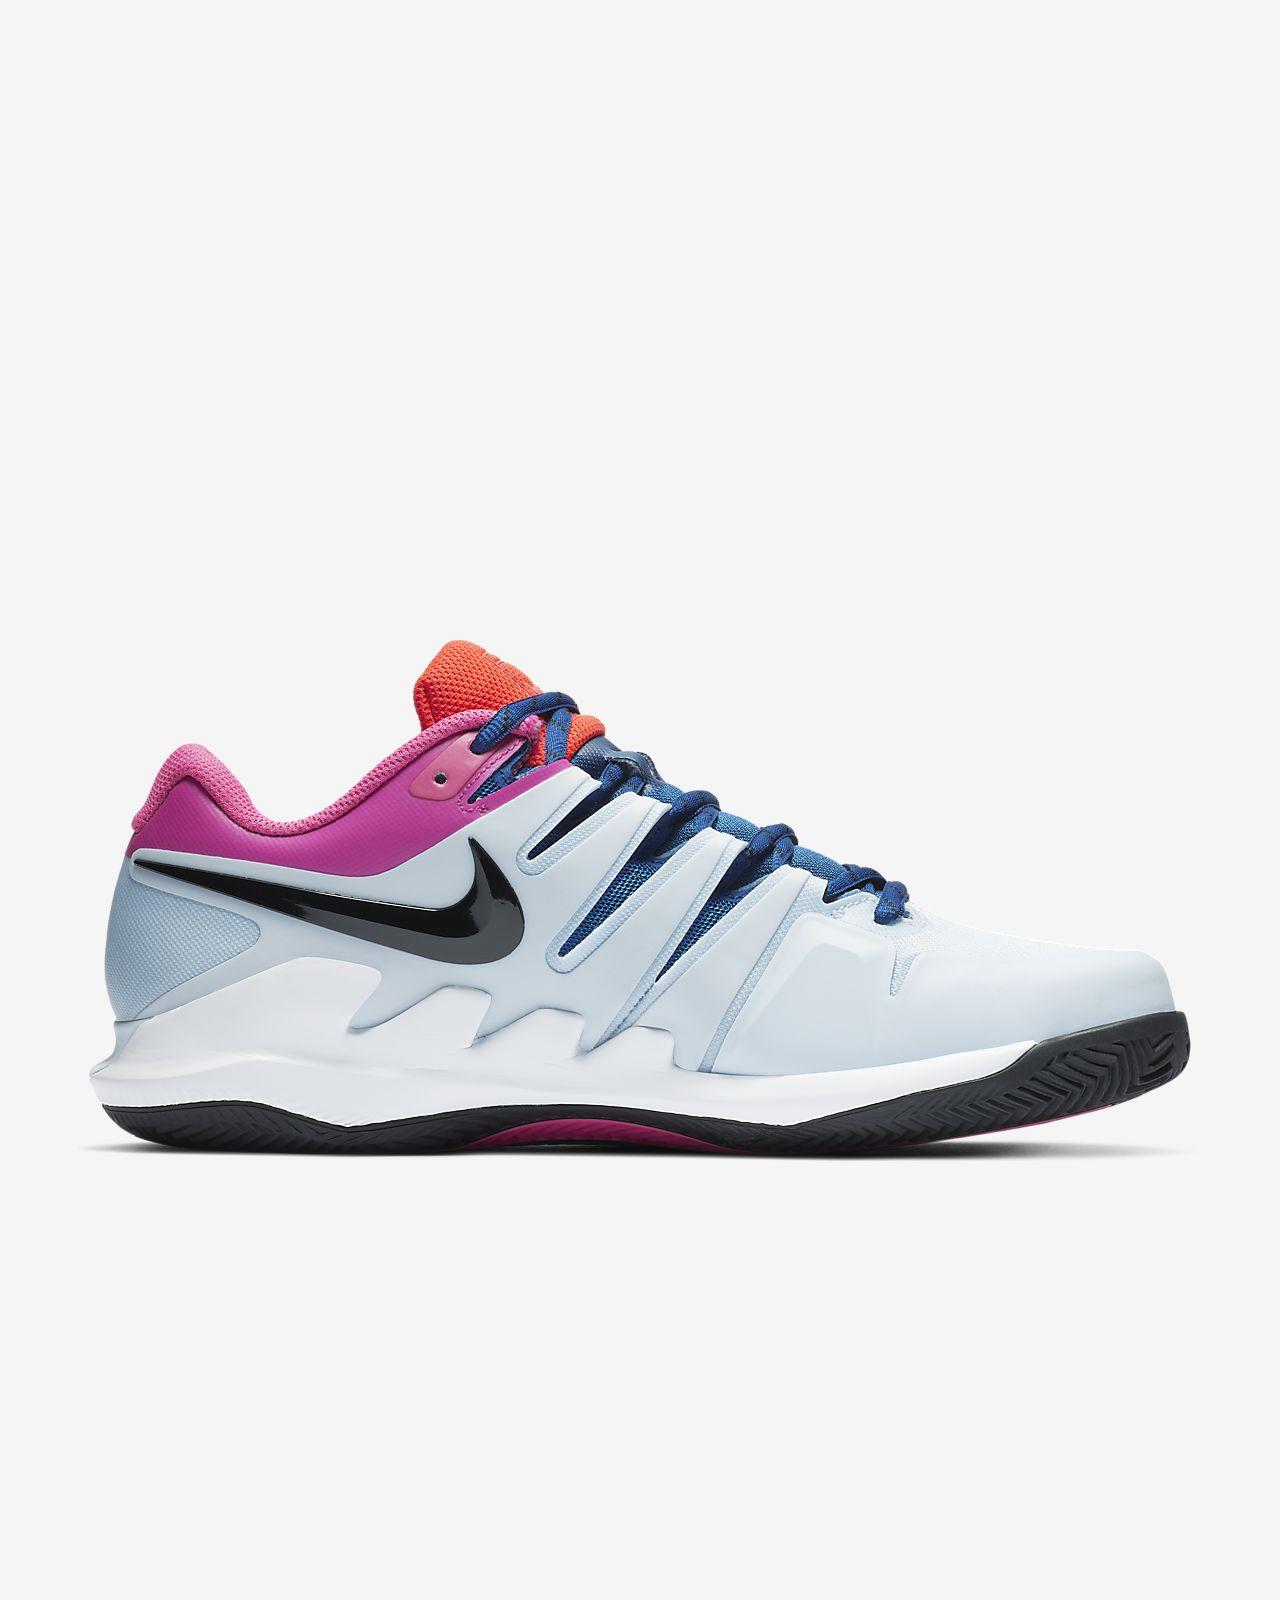 brand new 4e84e b1205 ... Chaussure de tennis Nike Air Zoom Vapor X Clay pour Homme